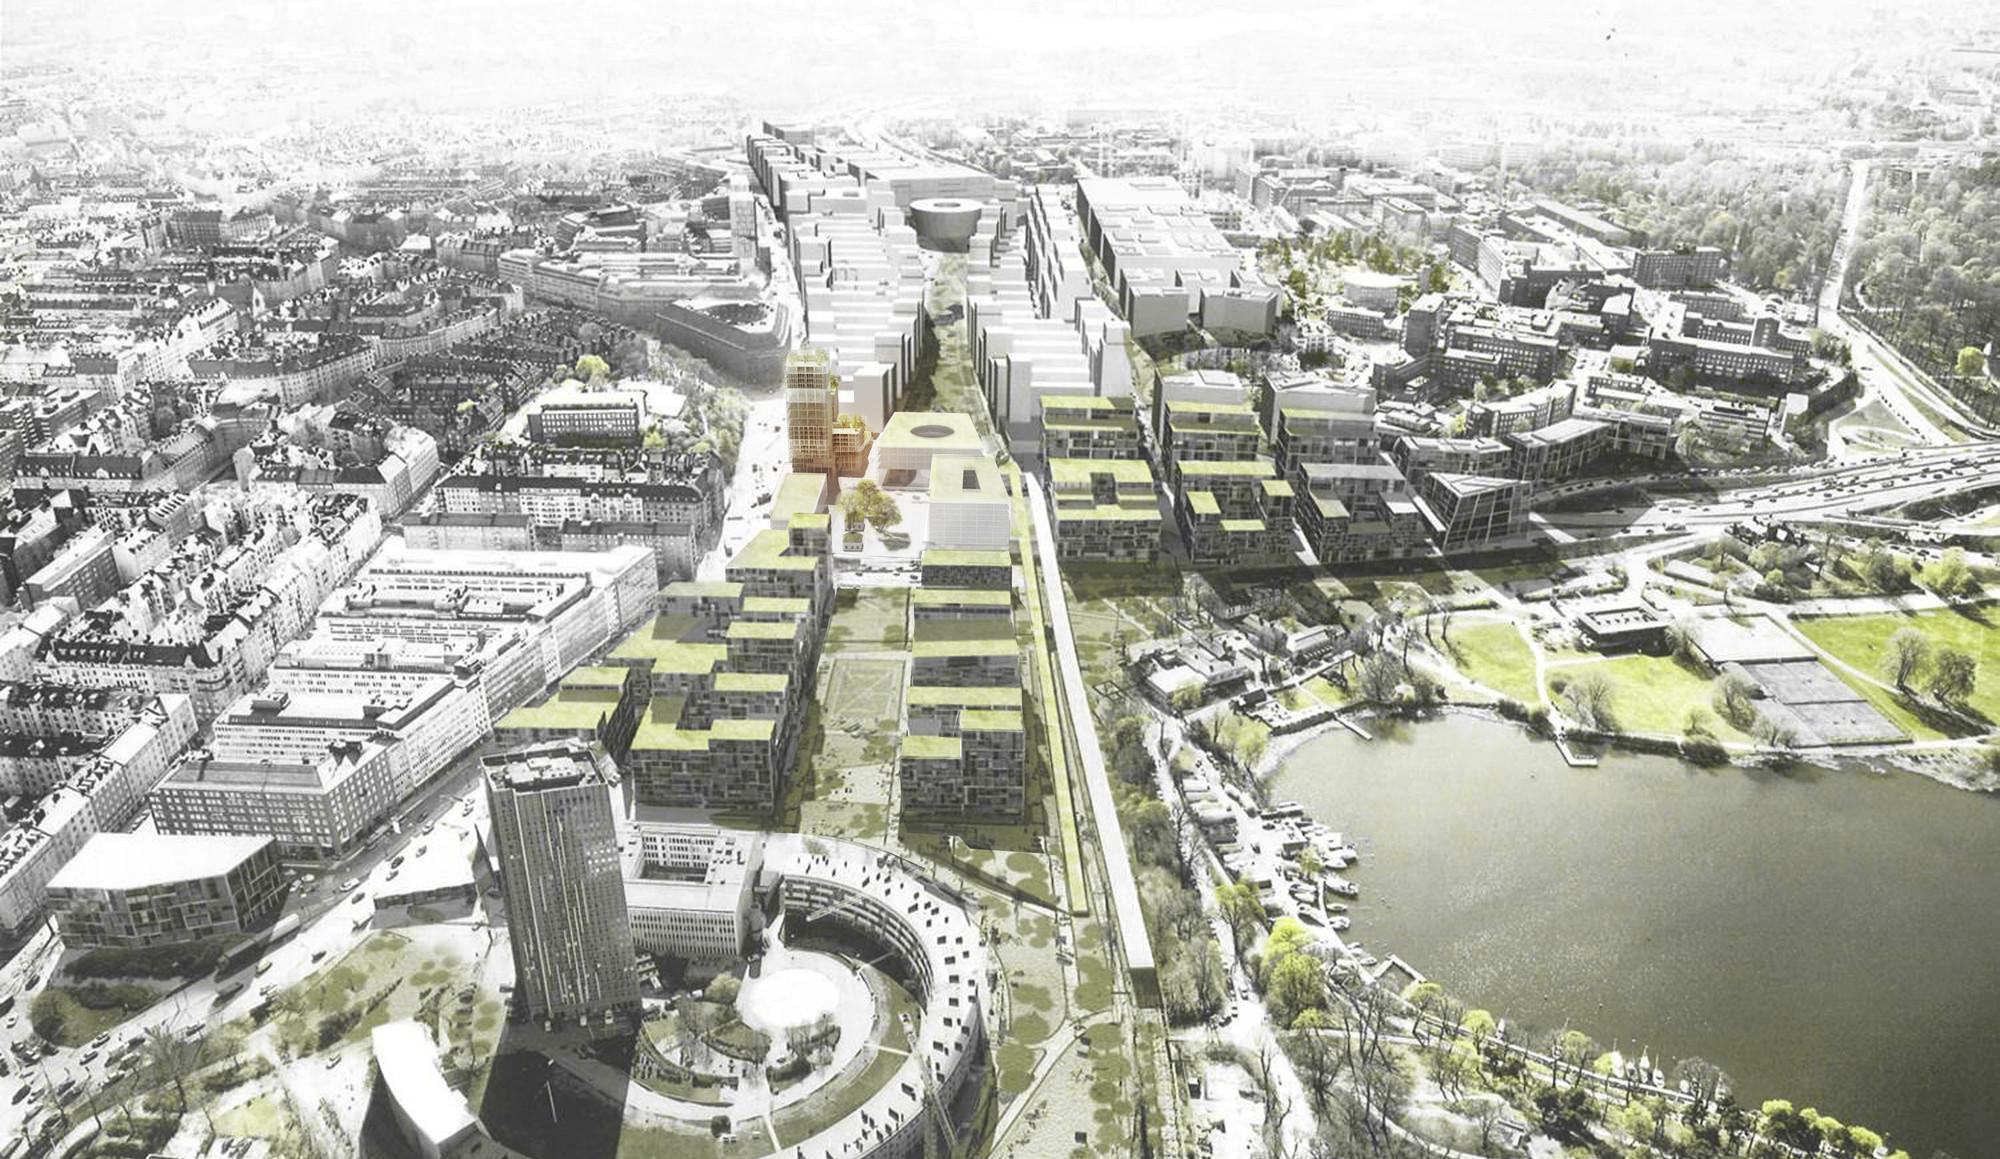 C.F. Møller And DinnellJohanssonu0027s Wooden Skyscraper Wins International  Competition,Vertical Urban Quarter: View From